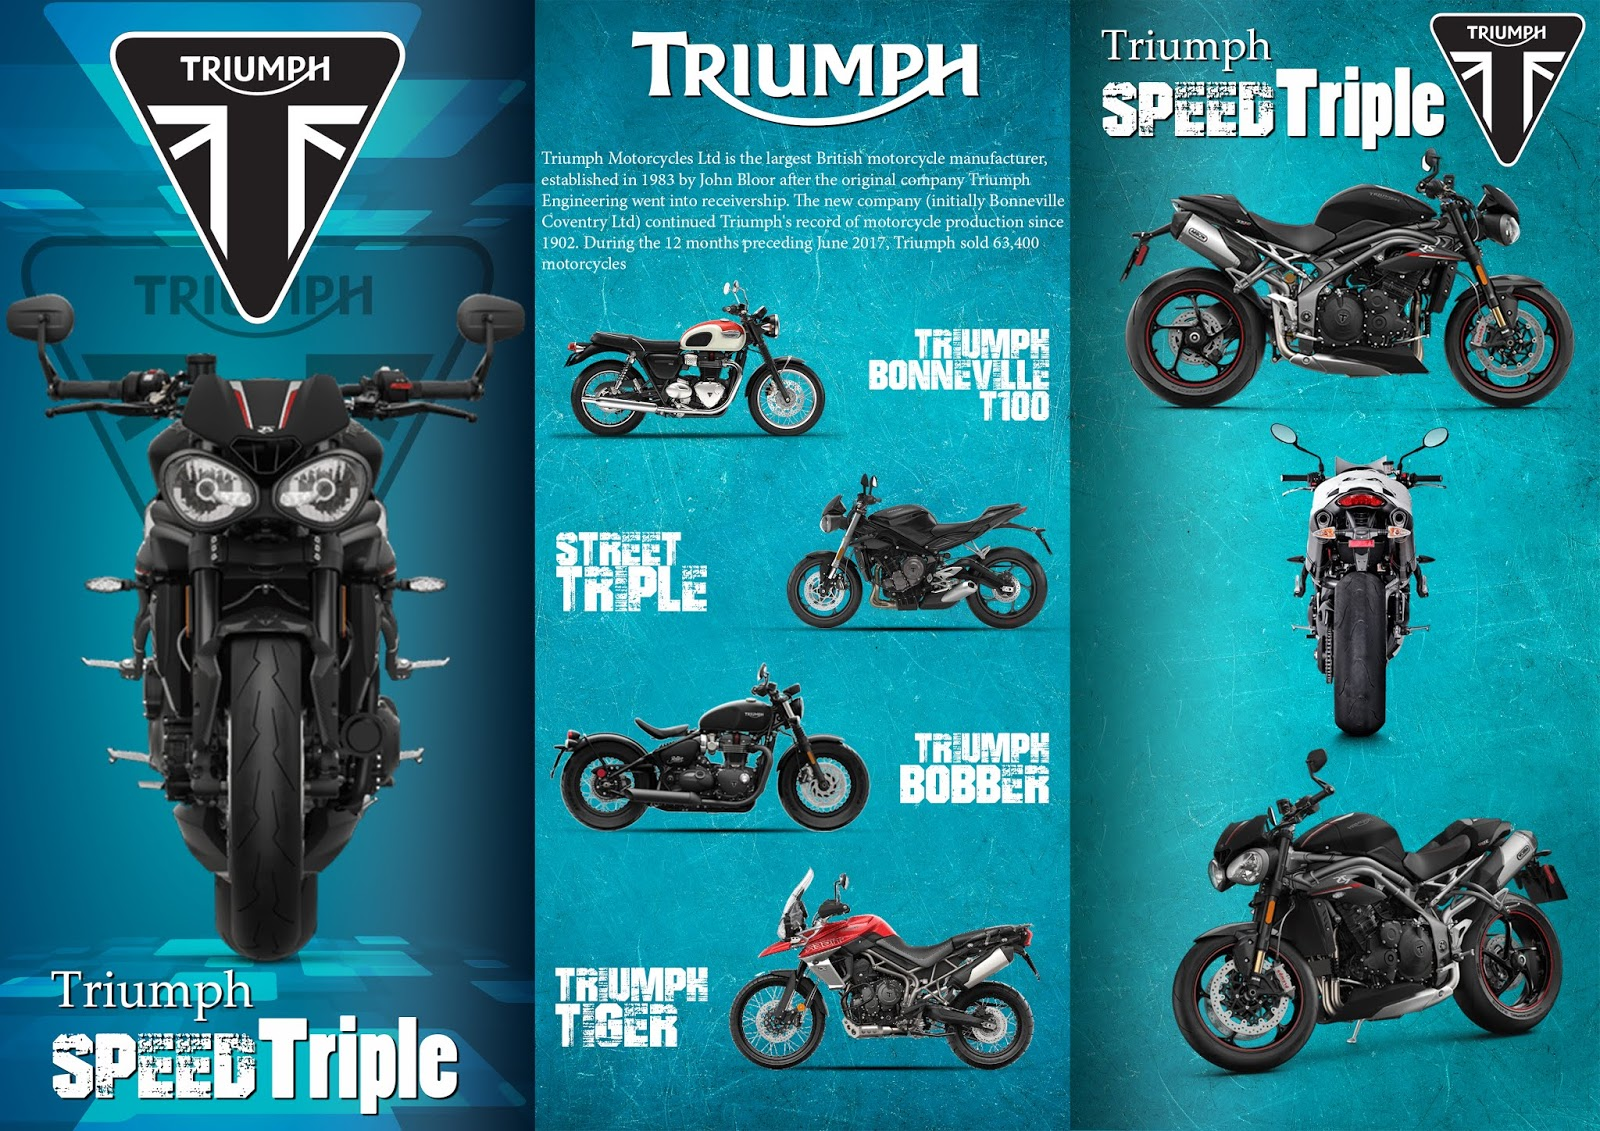 Barnik Art Triumph Speed Triple Brochure